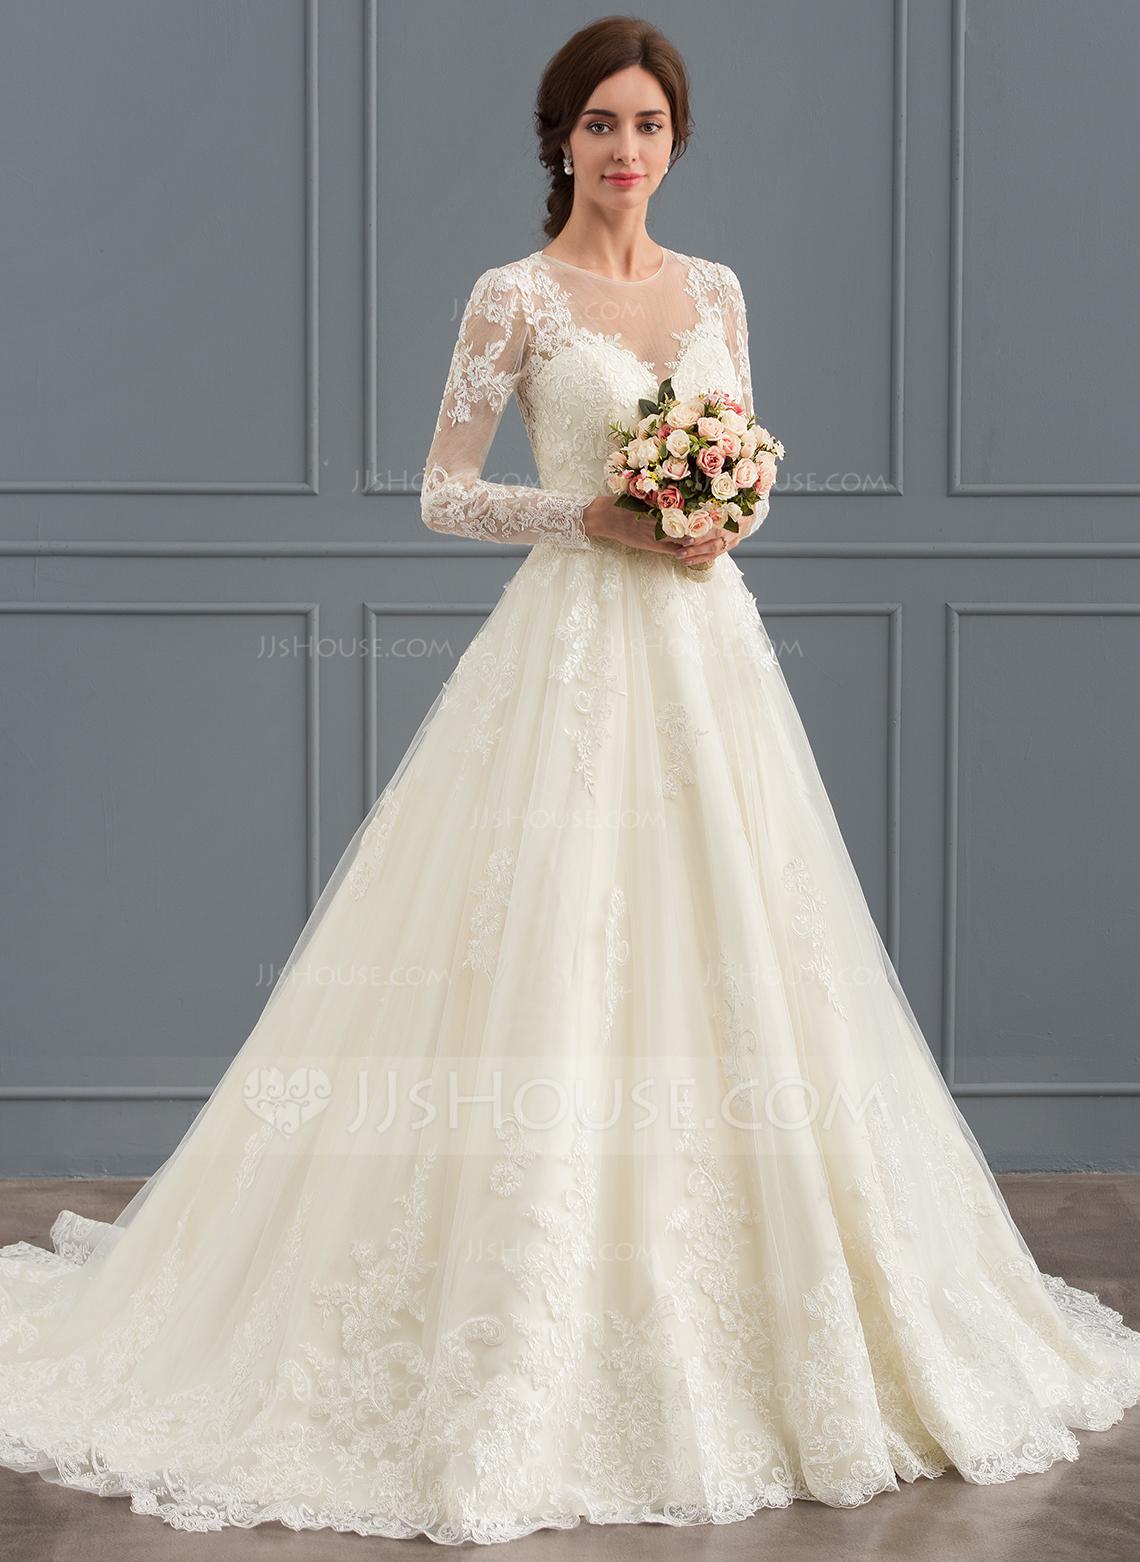 wedding dresses for court photo - 1